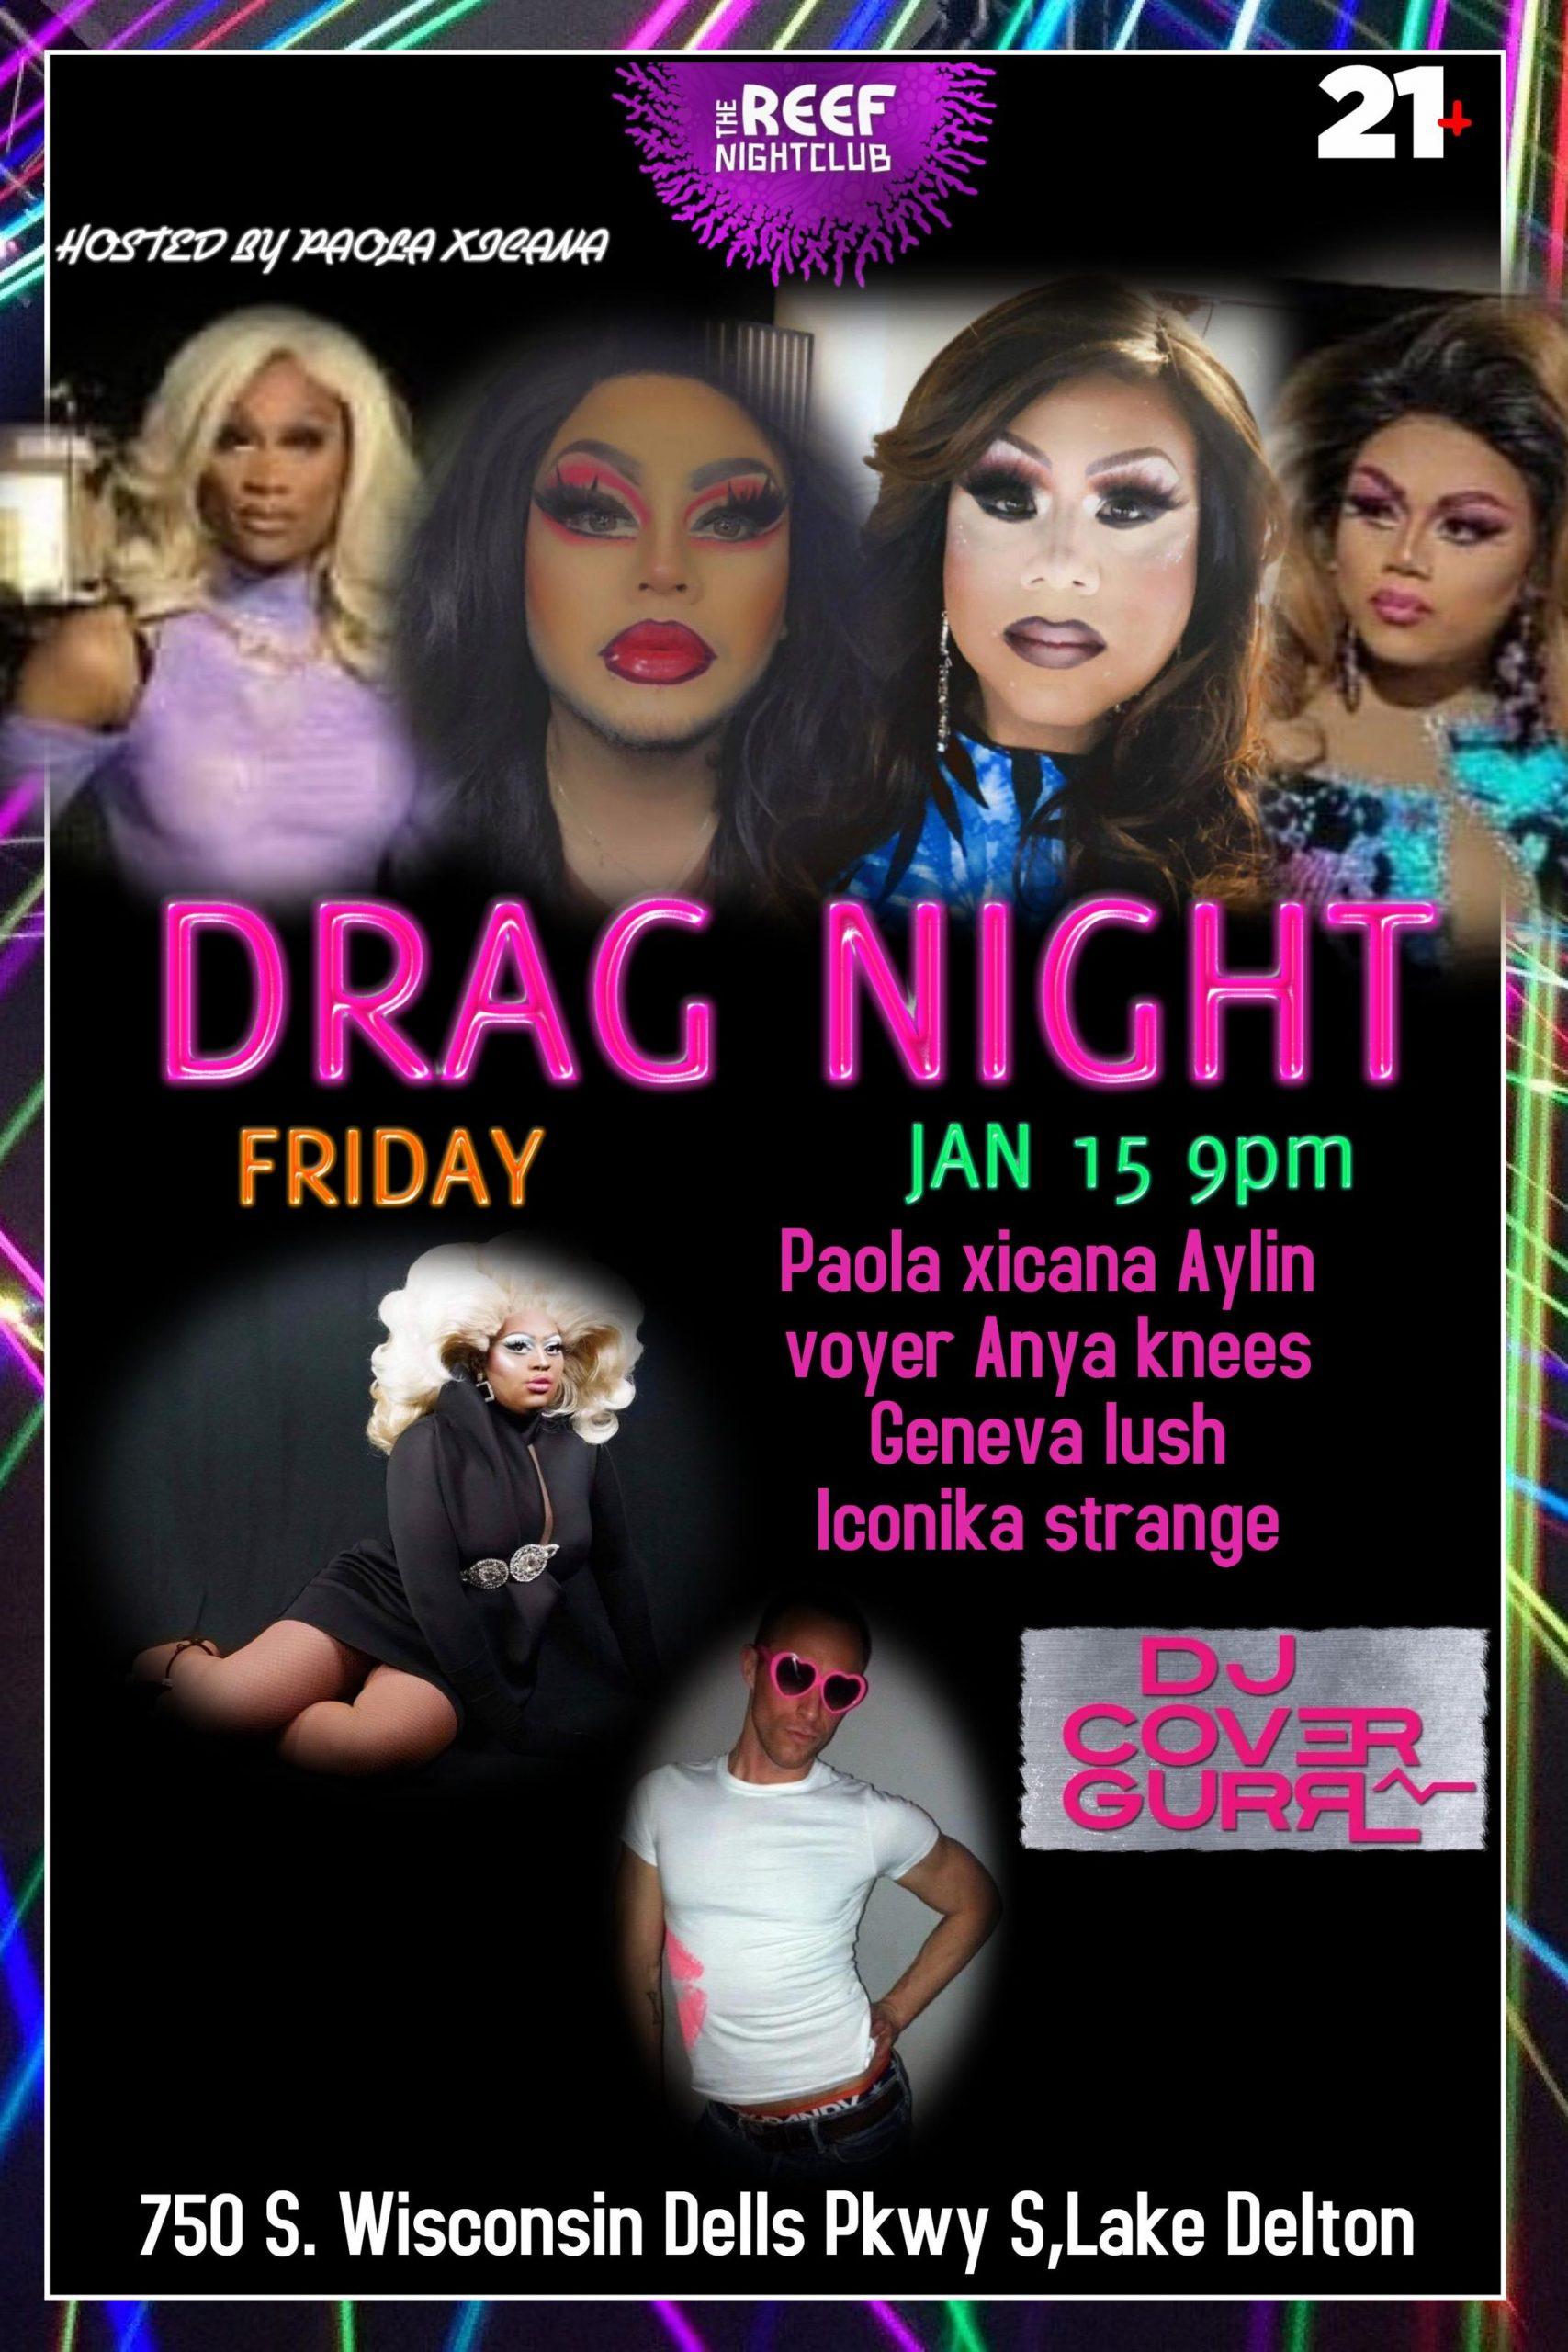 Drag Night at The Reef Night Club